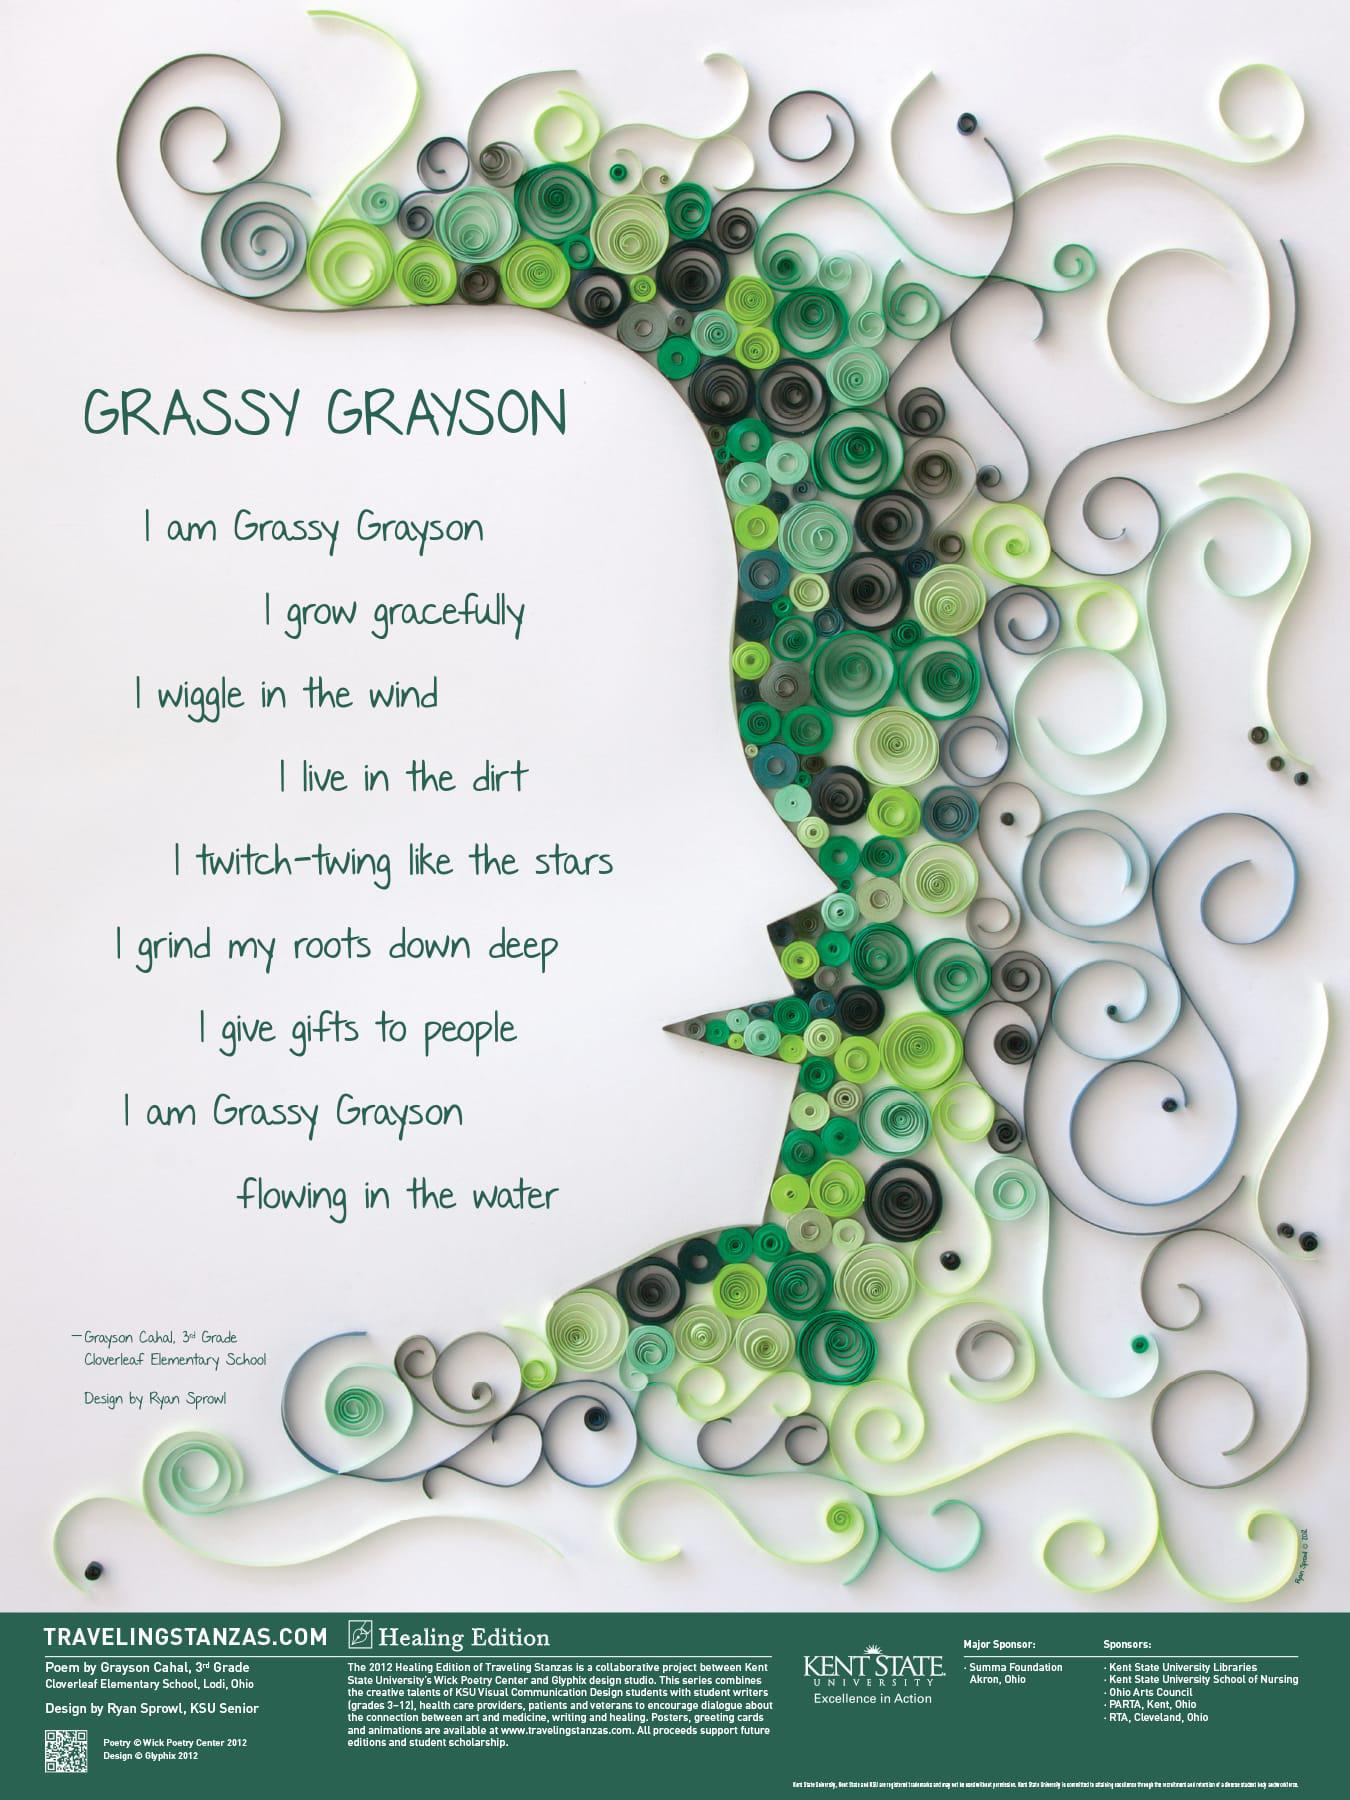 GrassyGrayson-Cahal-Poster